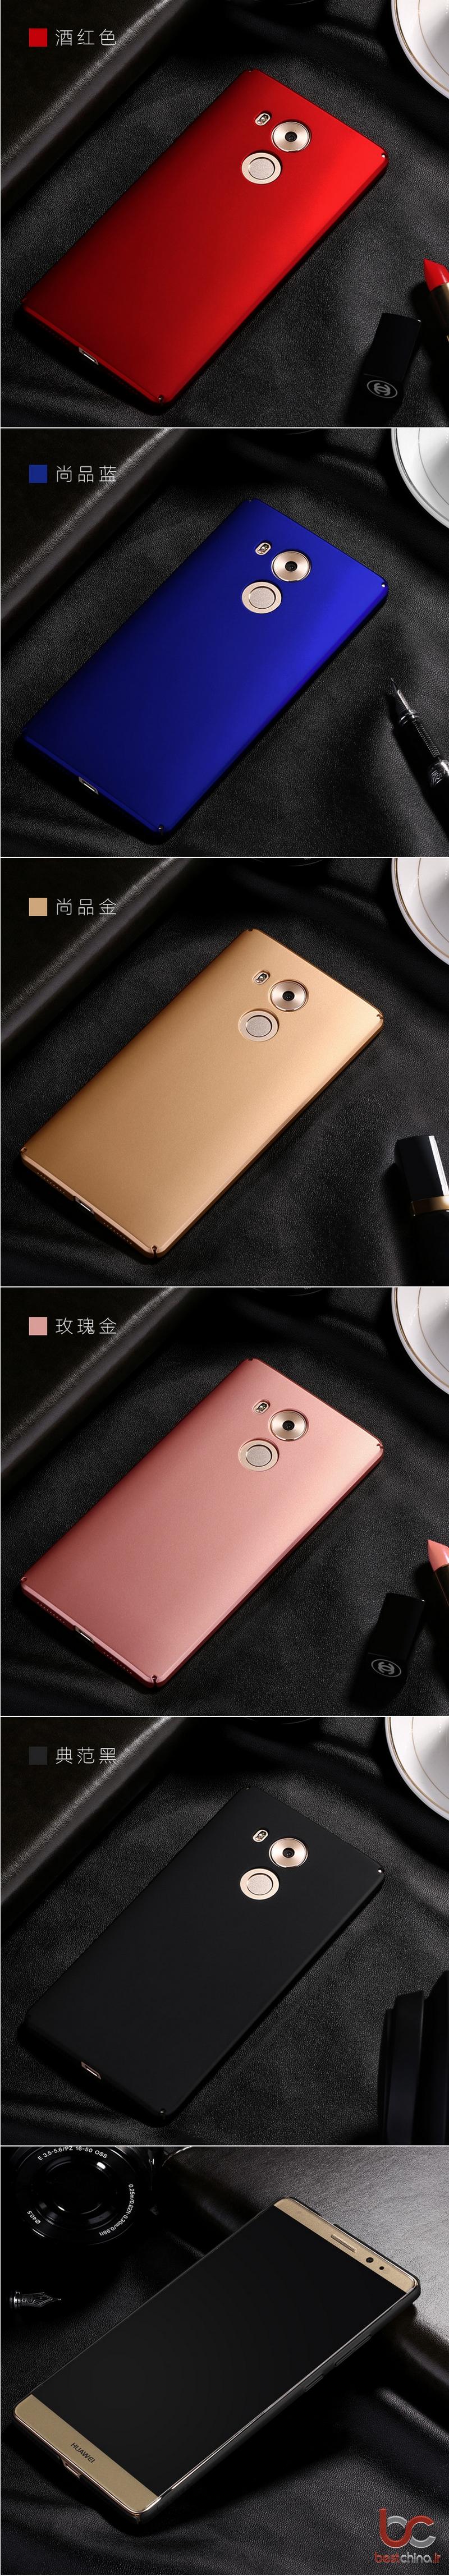 Huawei Mate 8 Back Cover (3)